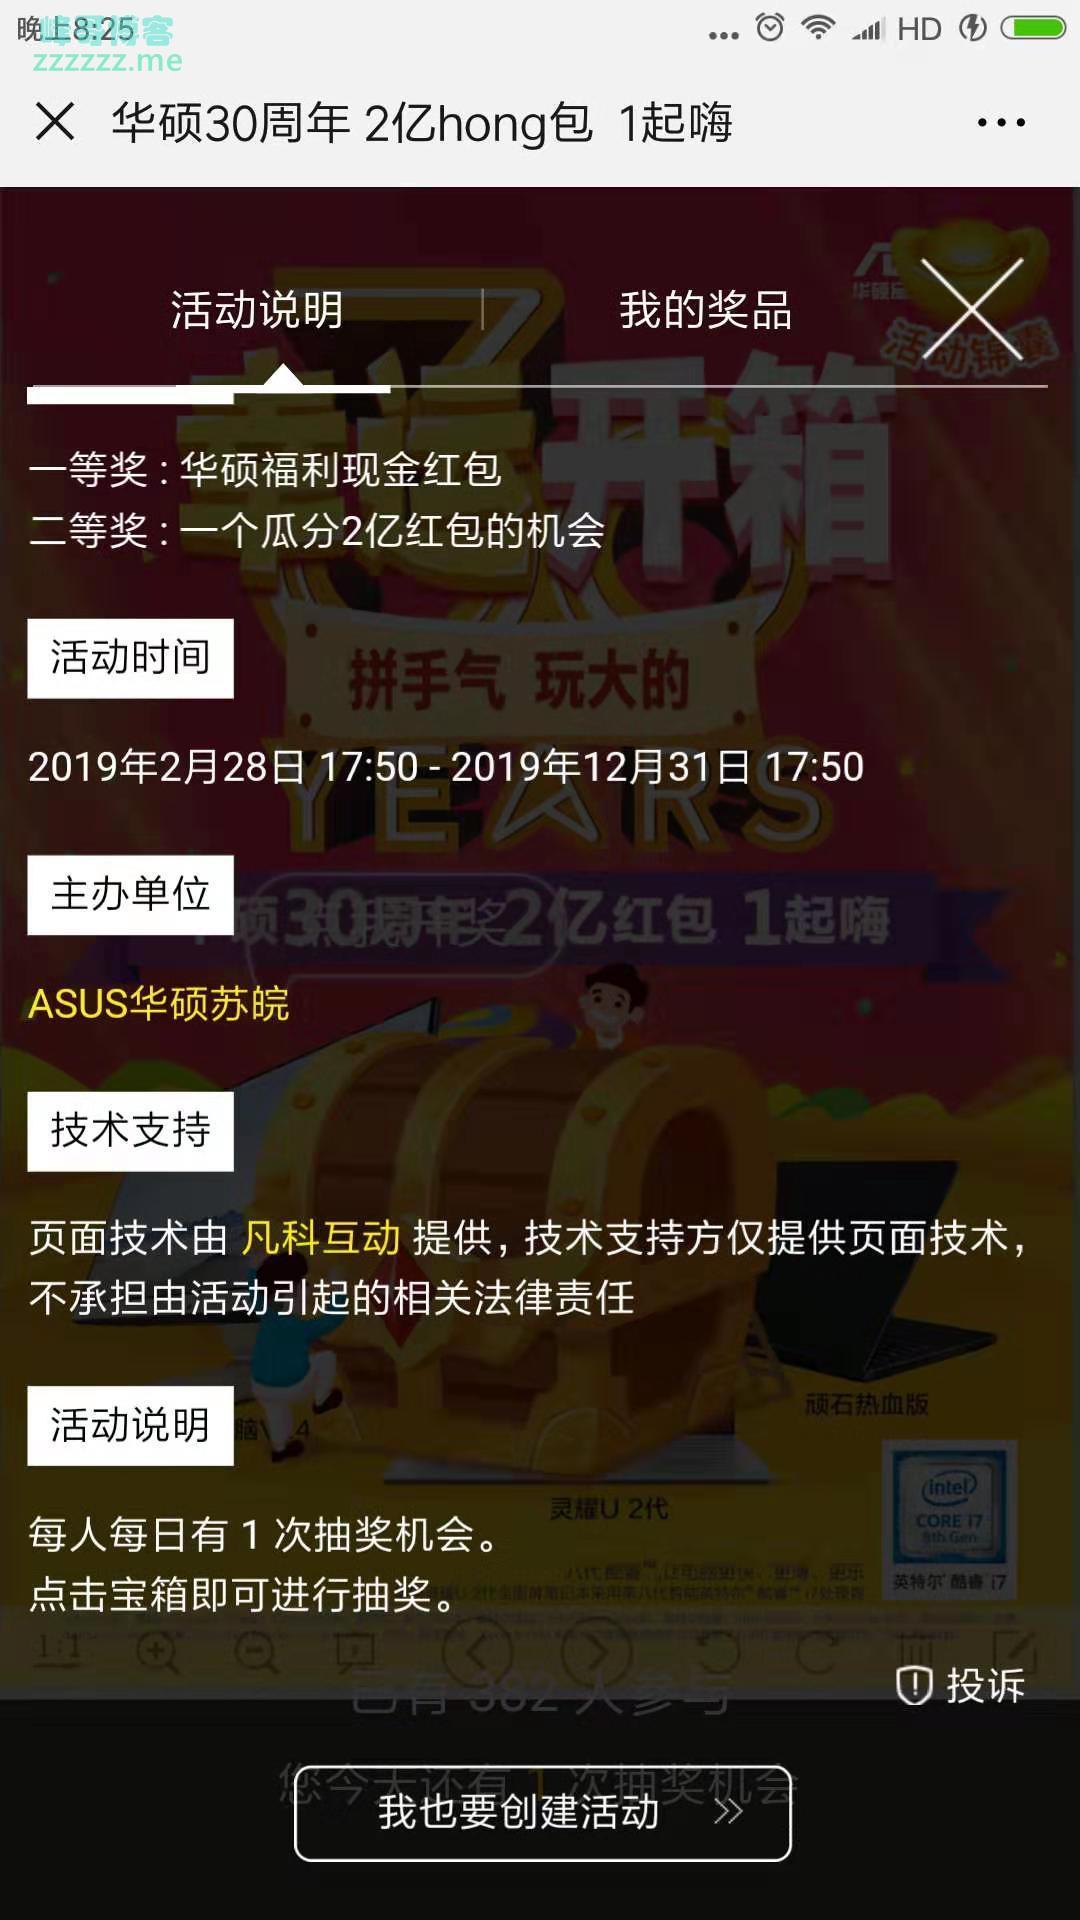 <ASUS华硕苏皖>换个姿势瓜分2亿红包(截止12月31日)